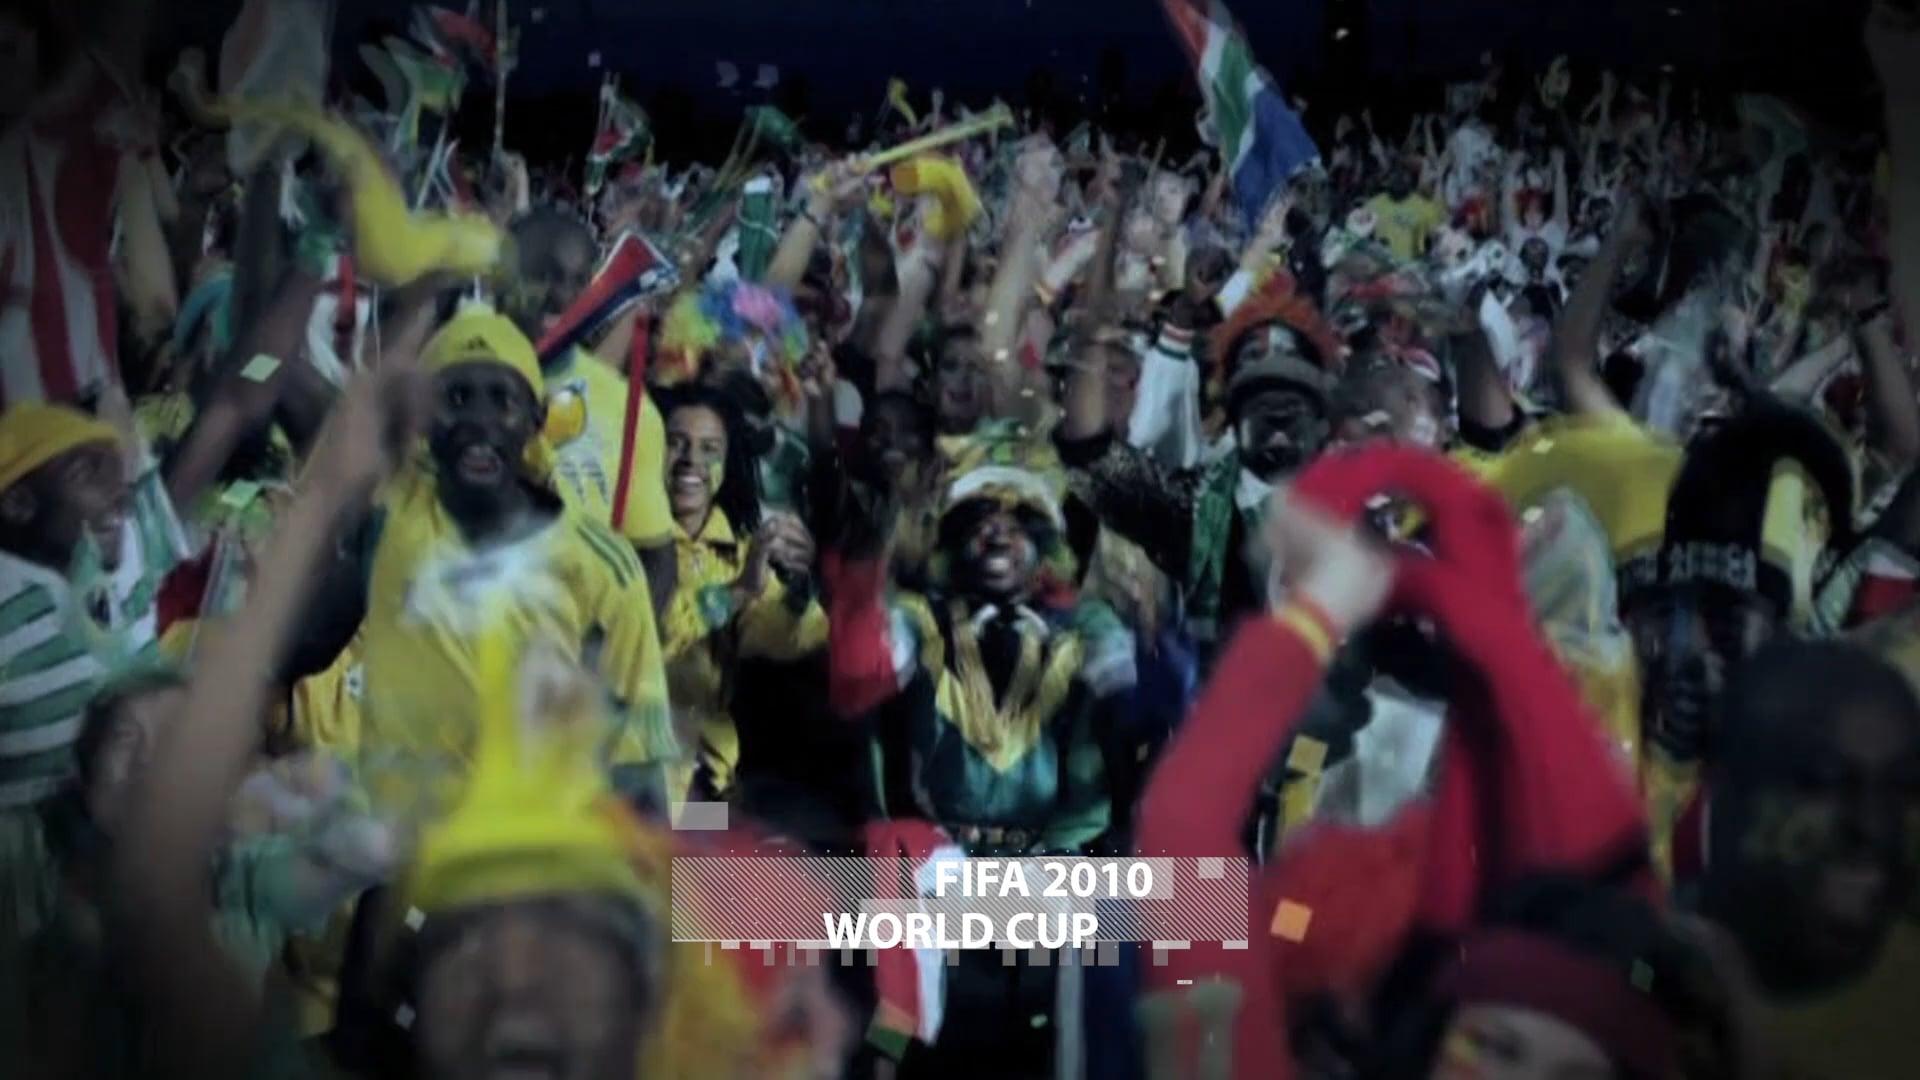 MOI WW EVENTS SHOWREEL 2019